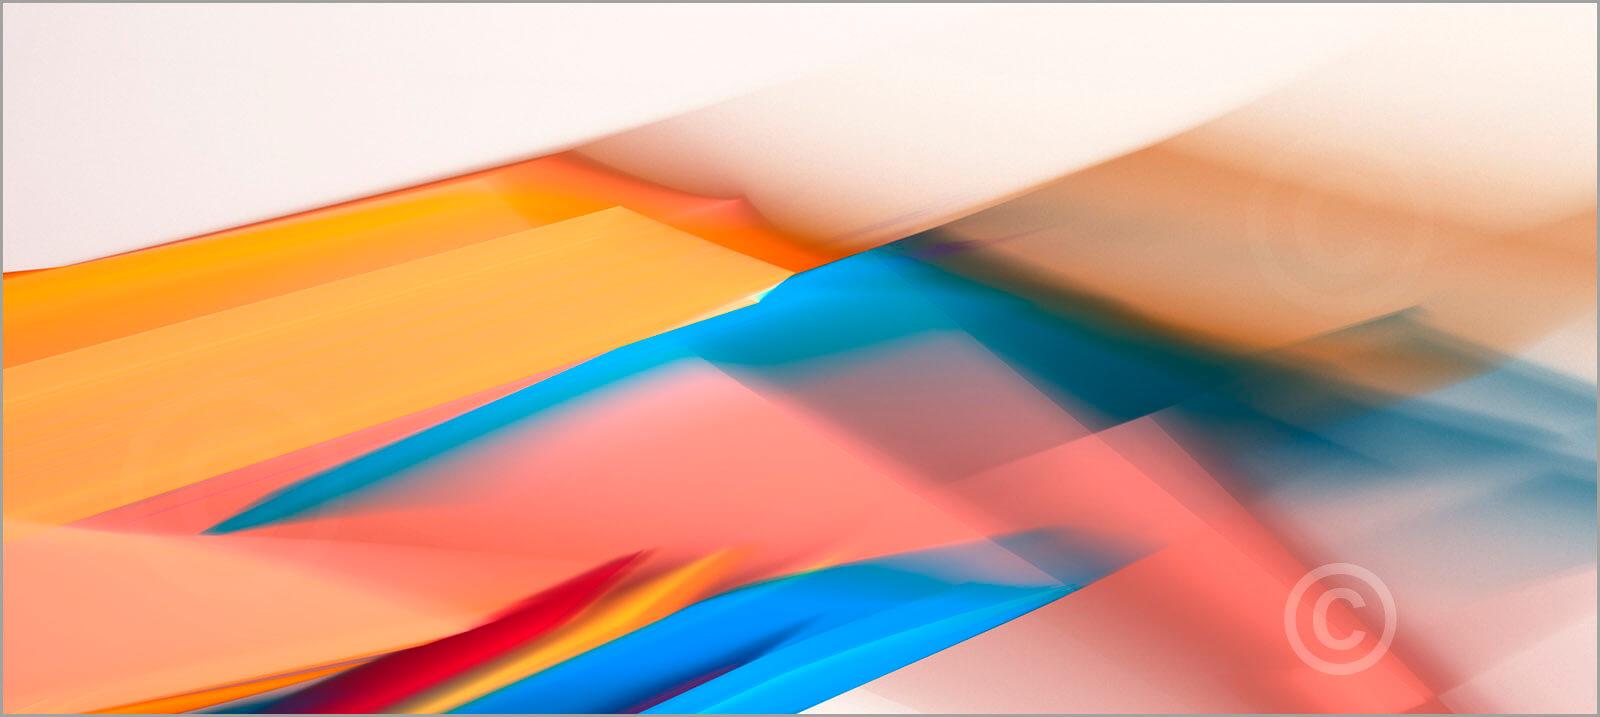 Colorshapes_F2_9838_XL